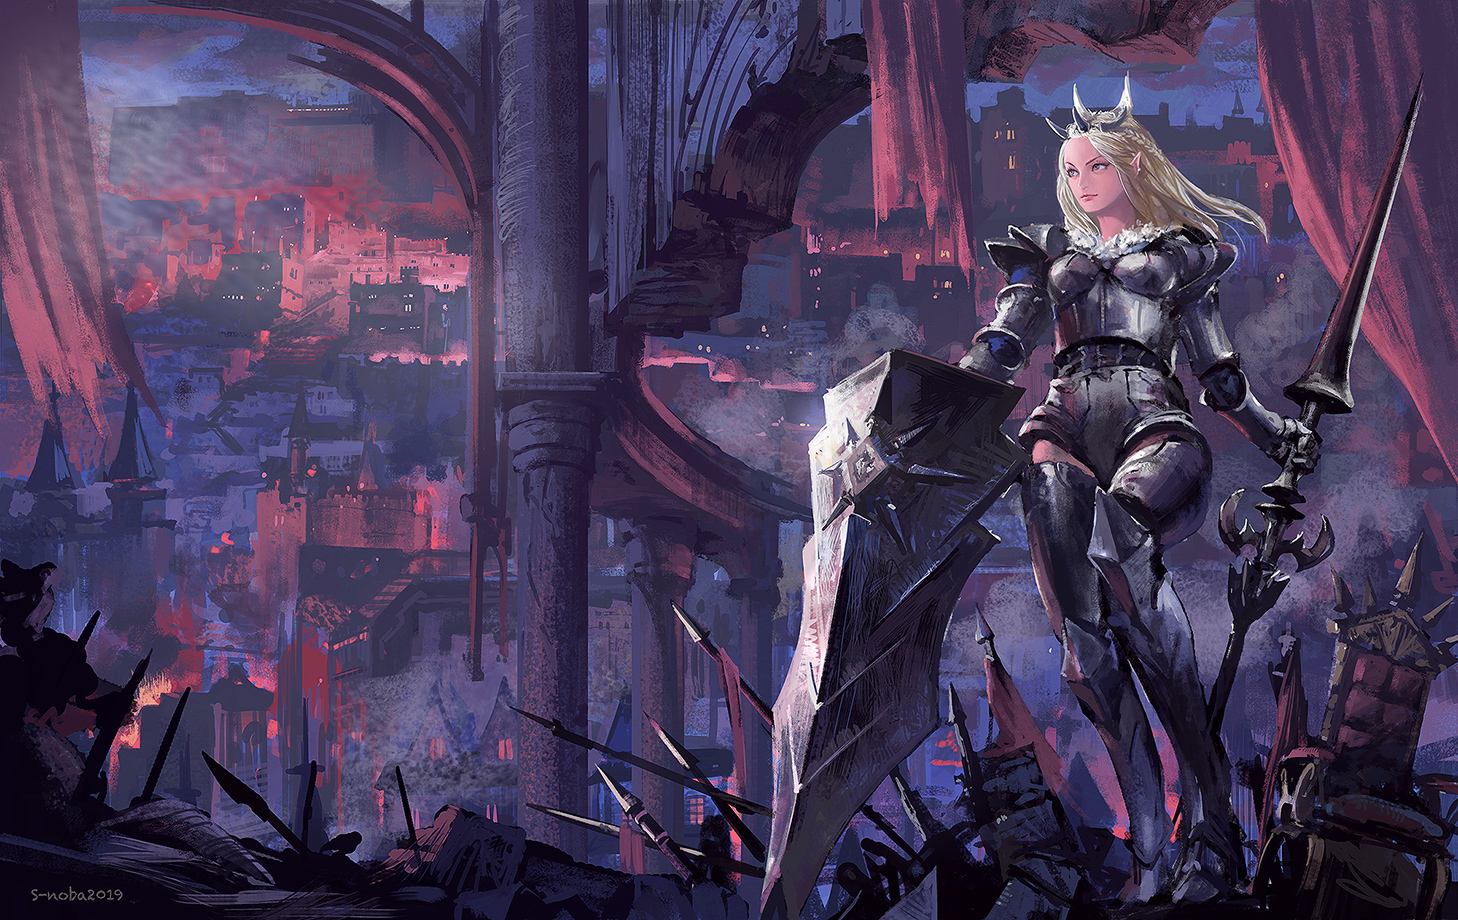 armor building crown noba original pixiv_fantasia spear watermark weapon